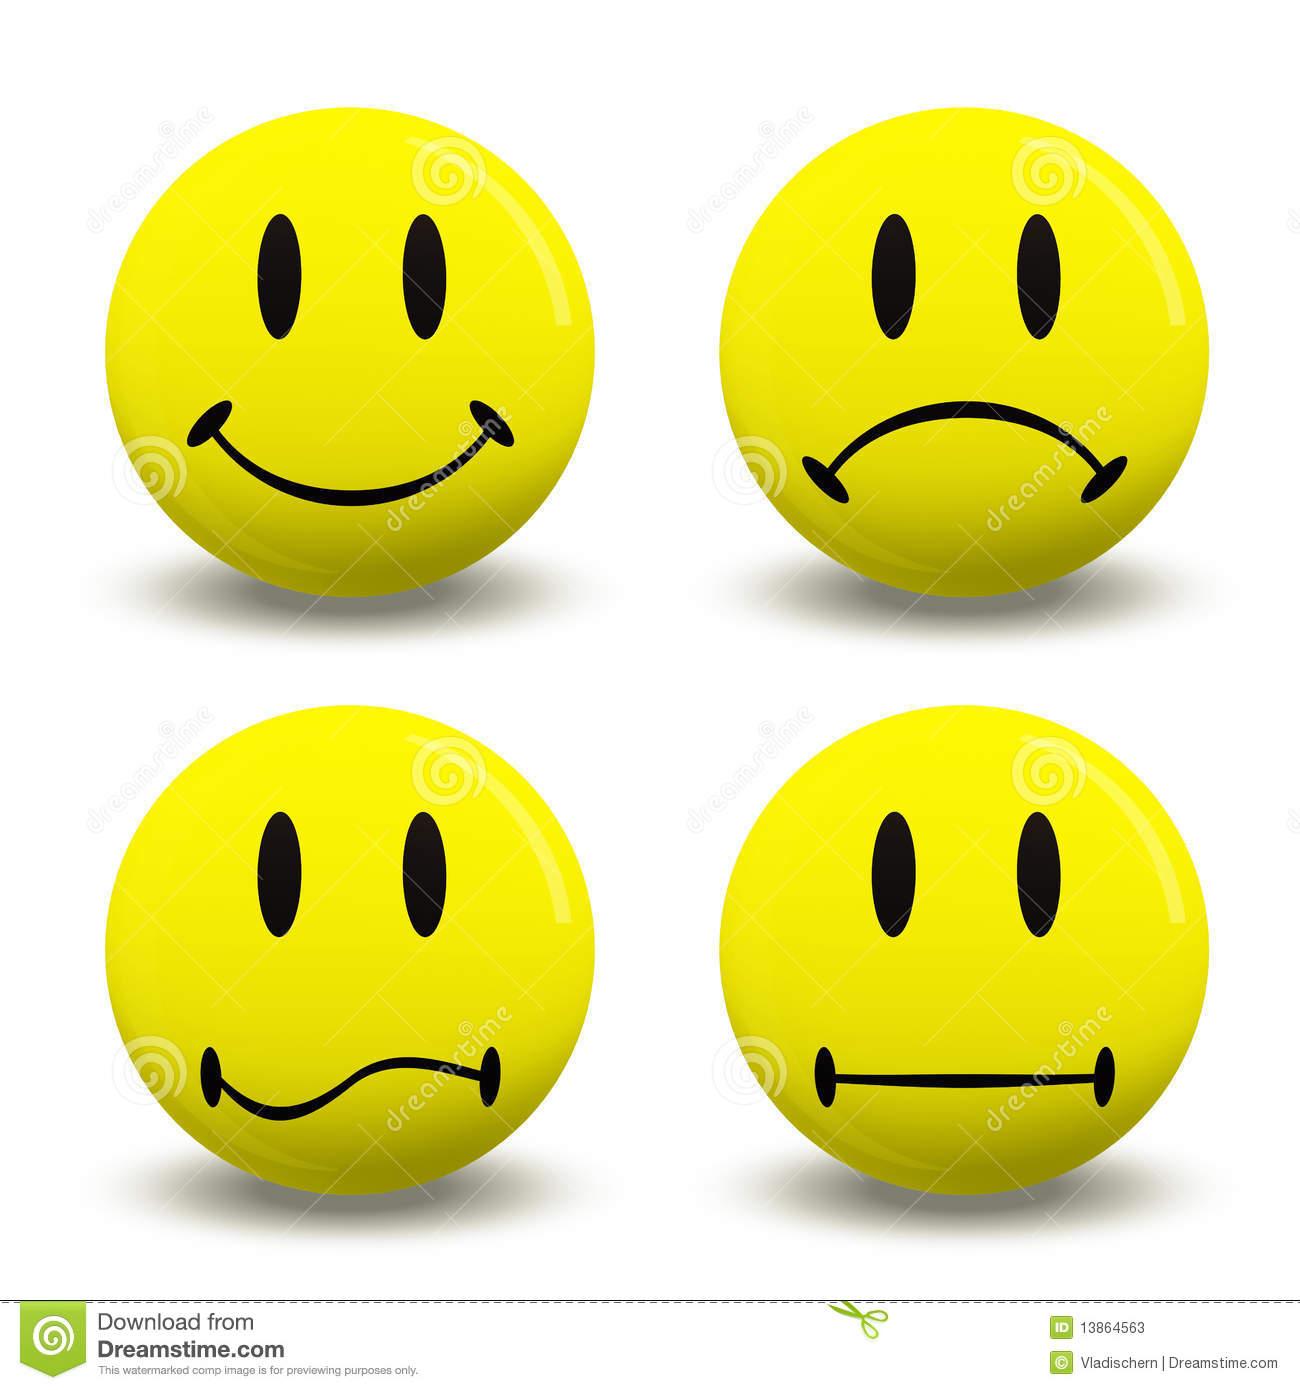 Free clipart emotion faces clip art transparent download 81+ Emotion Faces Clip Art | ClipartLook clip art transparent download